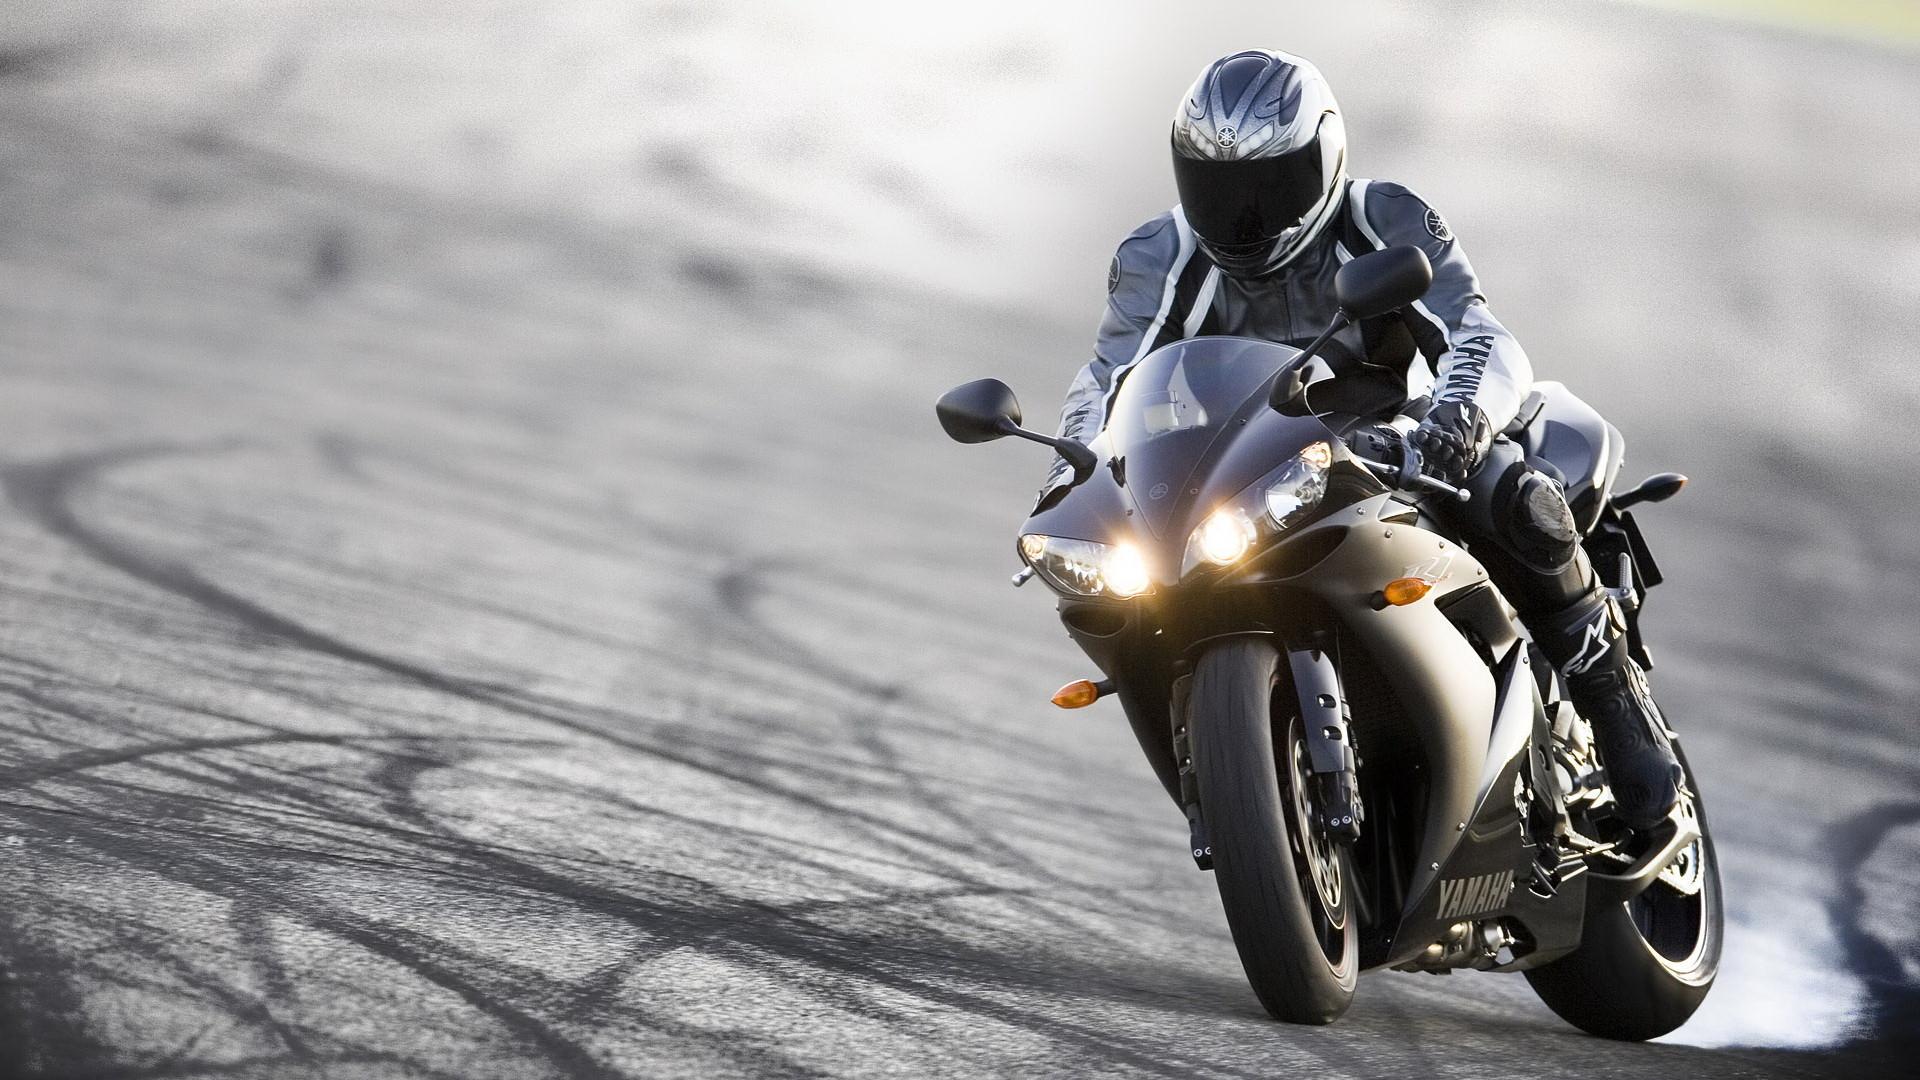 Yamaha Bike Wallpapers : Get Free top quality Yamaha Bike Wallpapers for  your desktop PC background